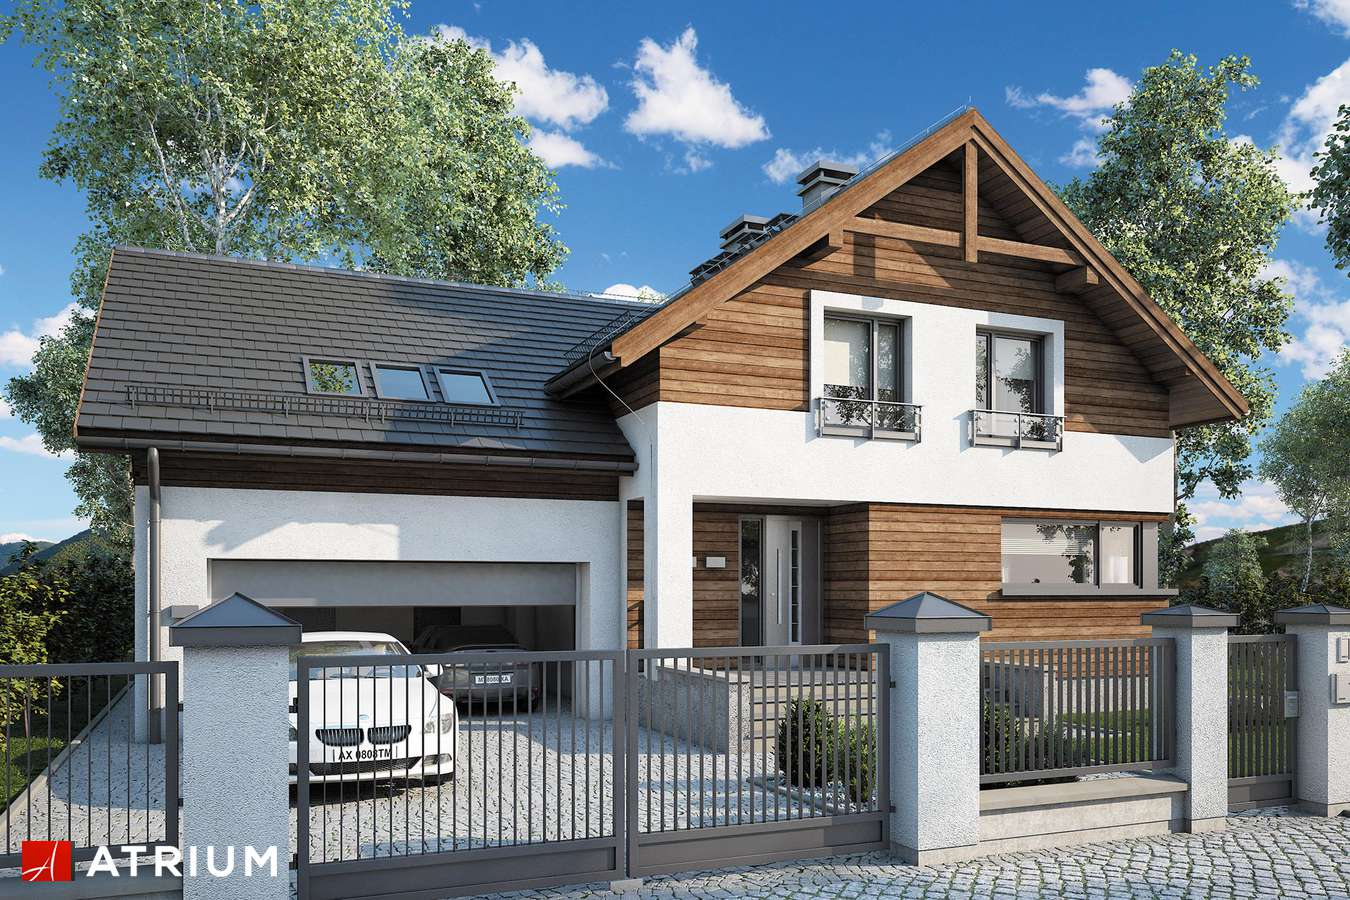 Projekty domów - Projekt domu z poddaszem JUPITER V - wizualizacja 1